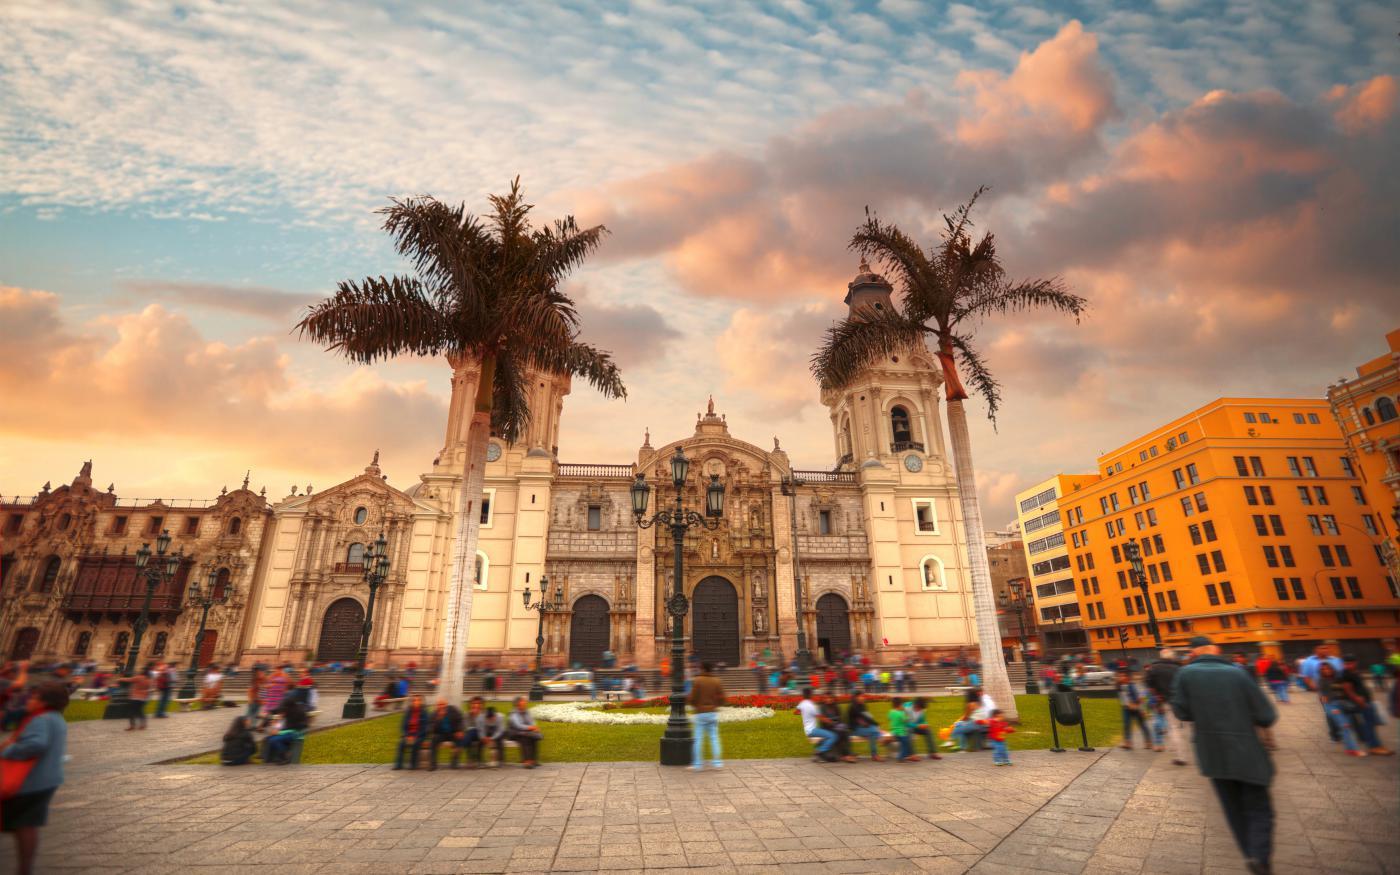 Peru ontving 2,7 miljoen toeristen in 2018